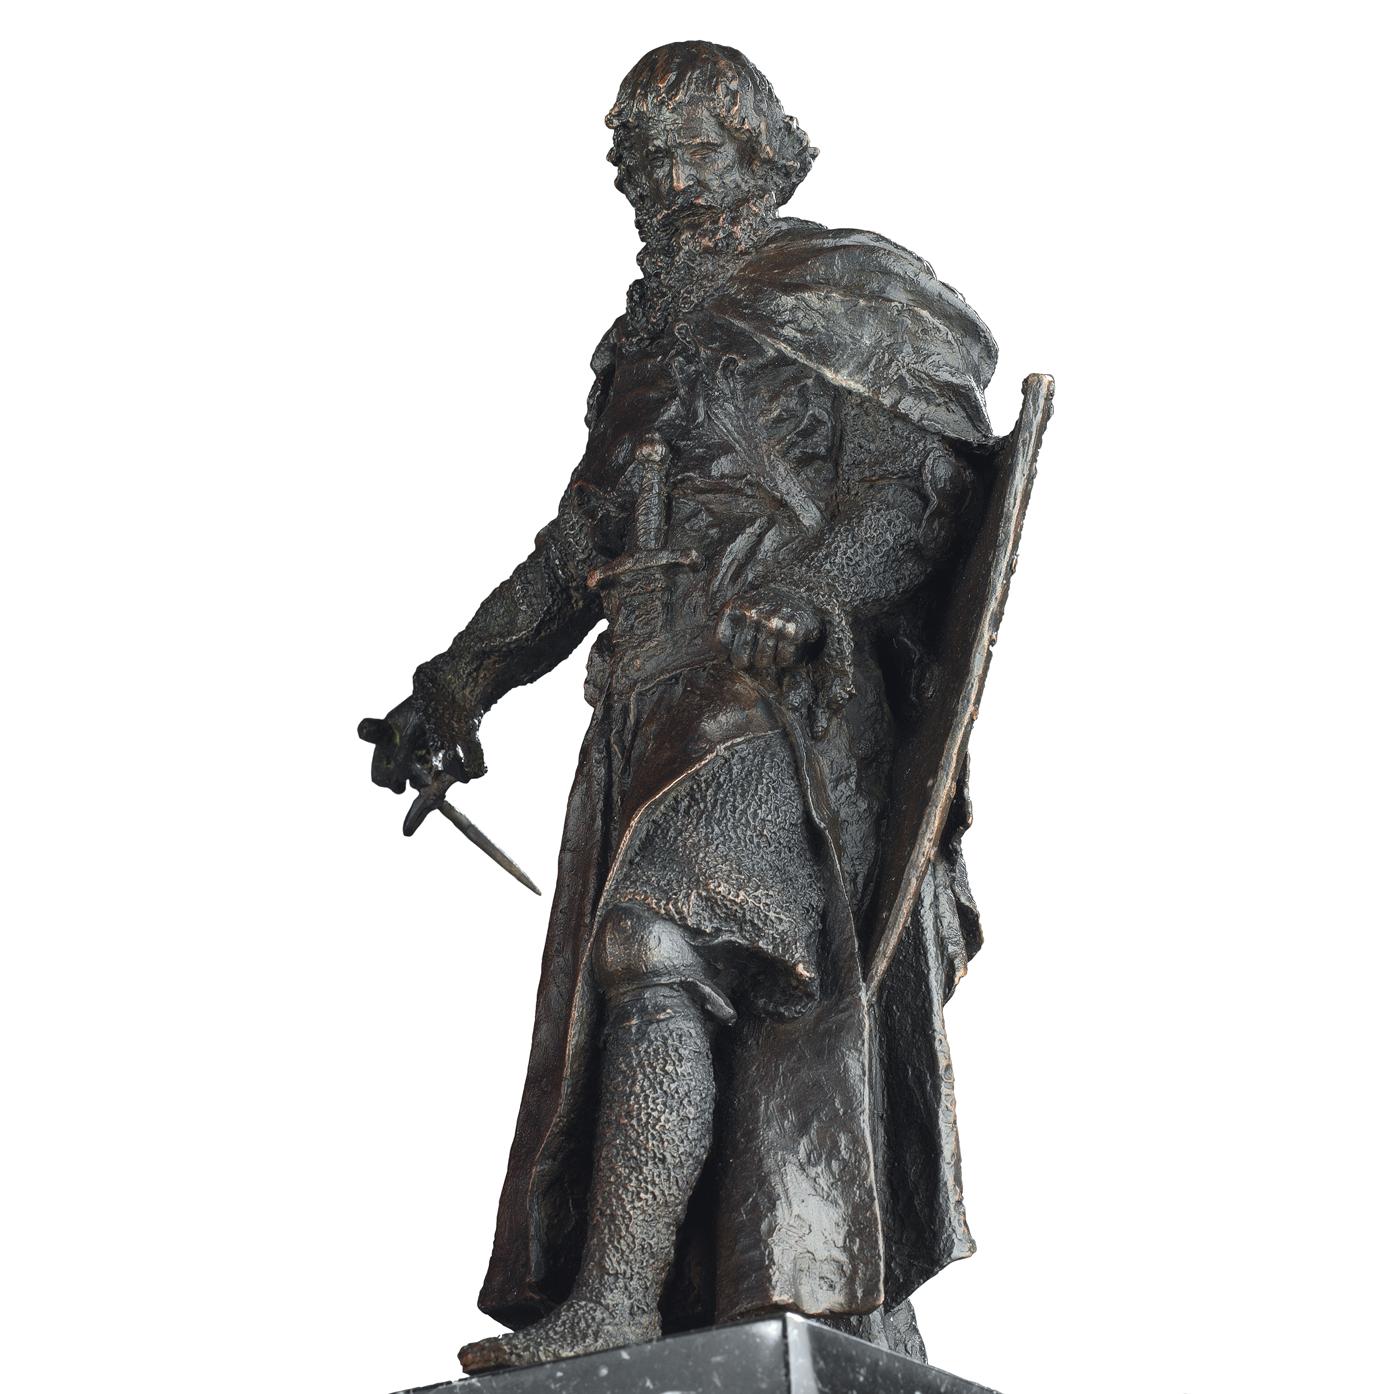 Guzman el bueno escultura histórica Madrid